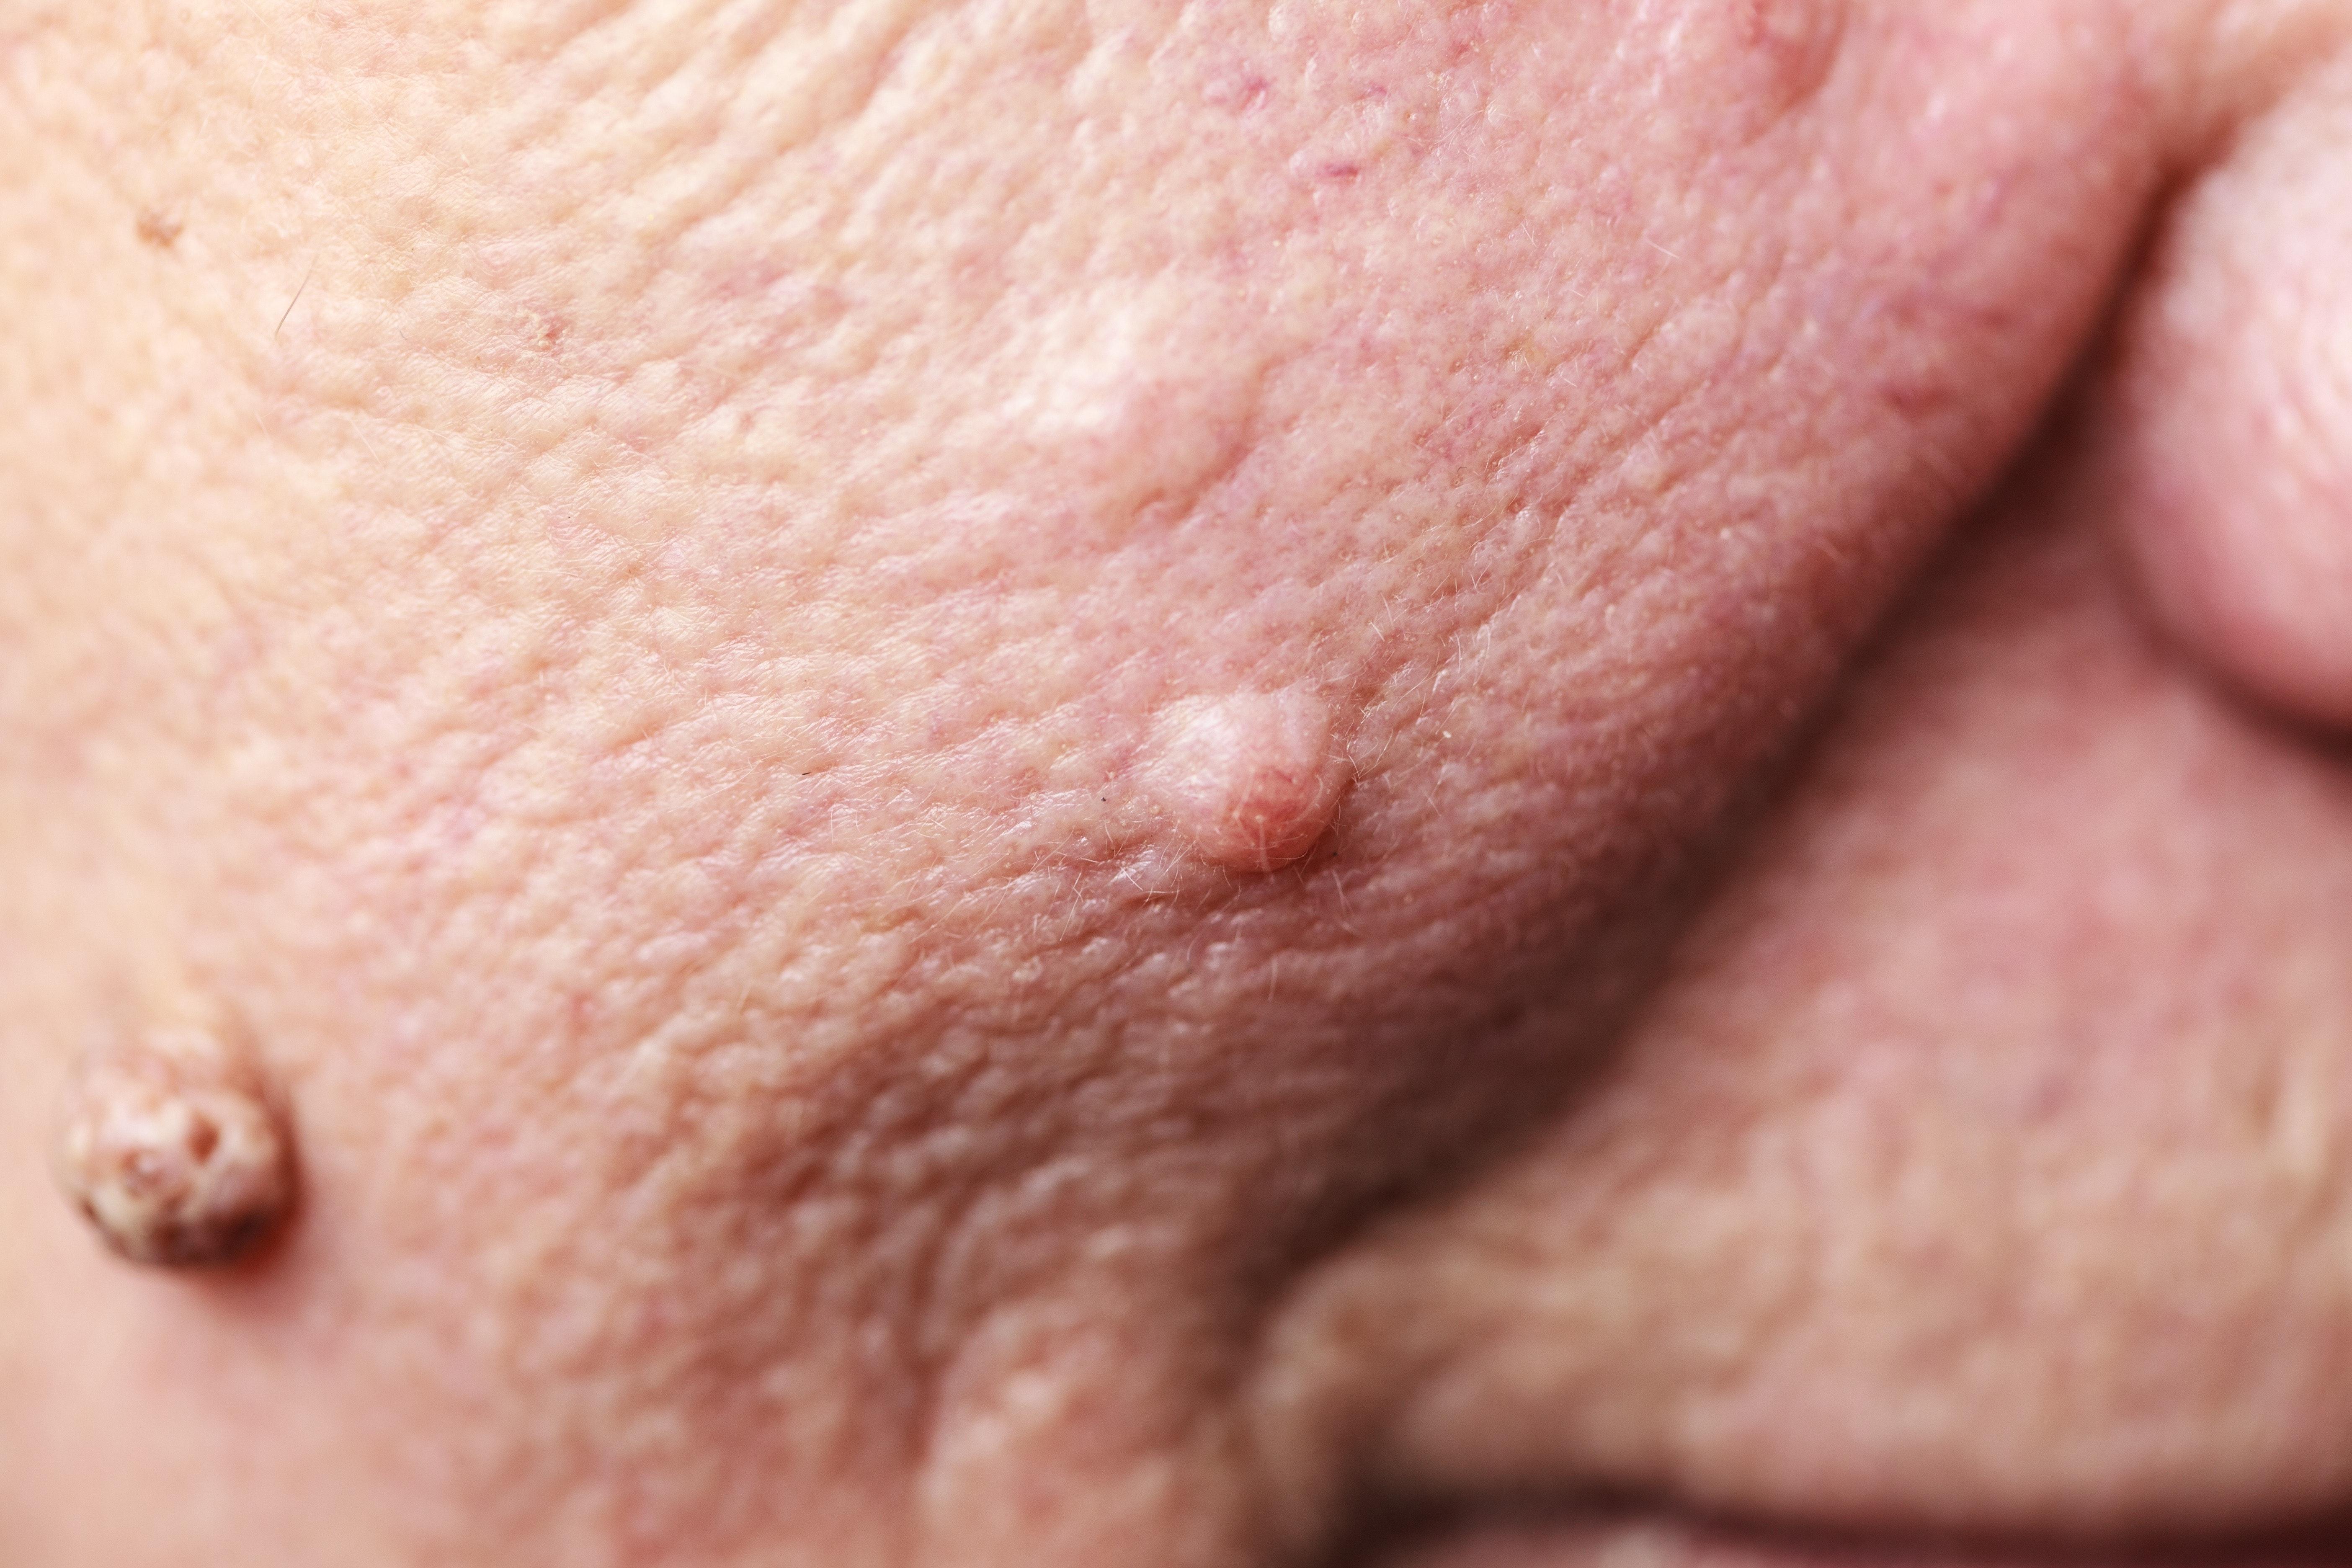 Fleshy bumps on vagina